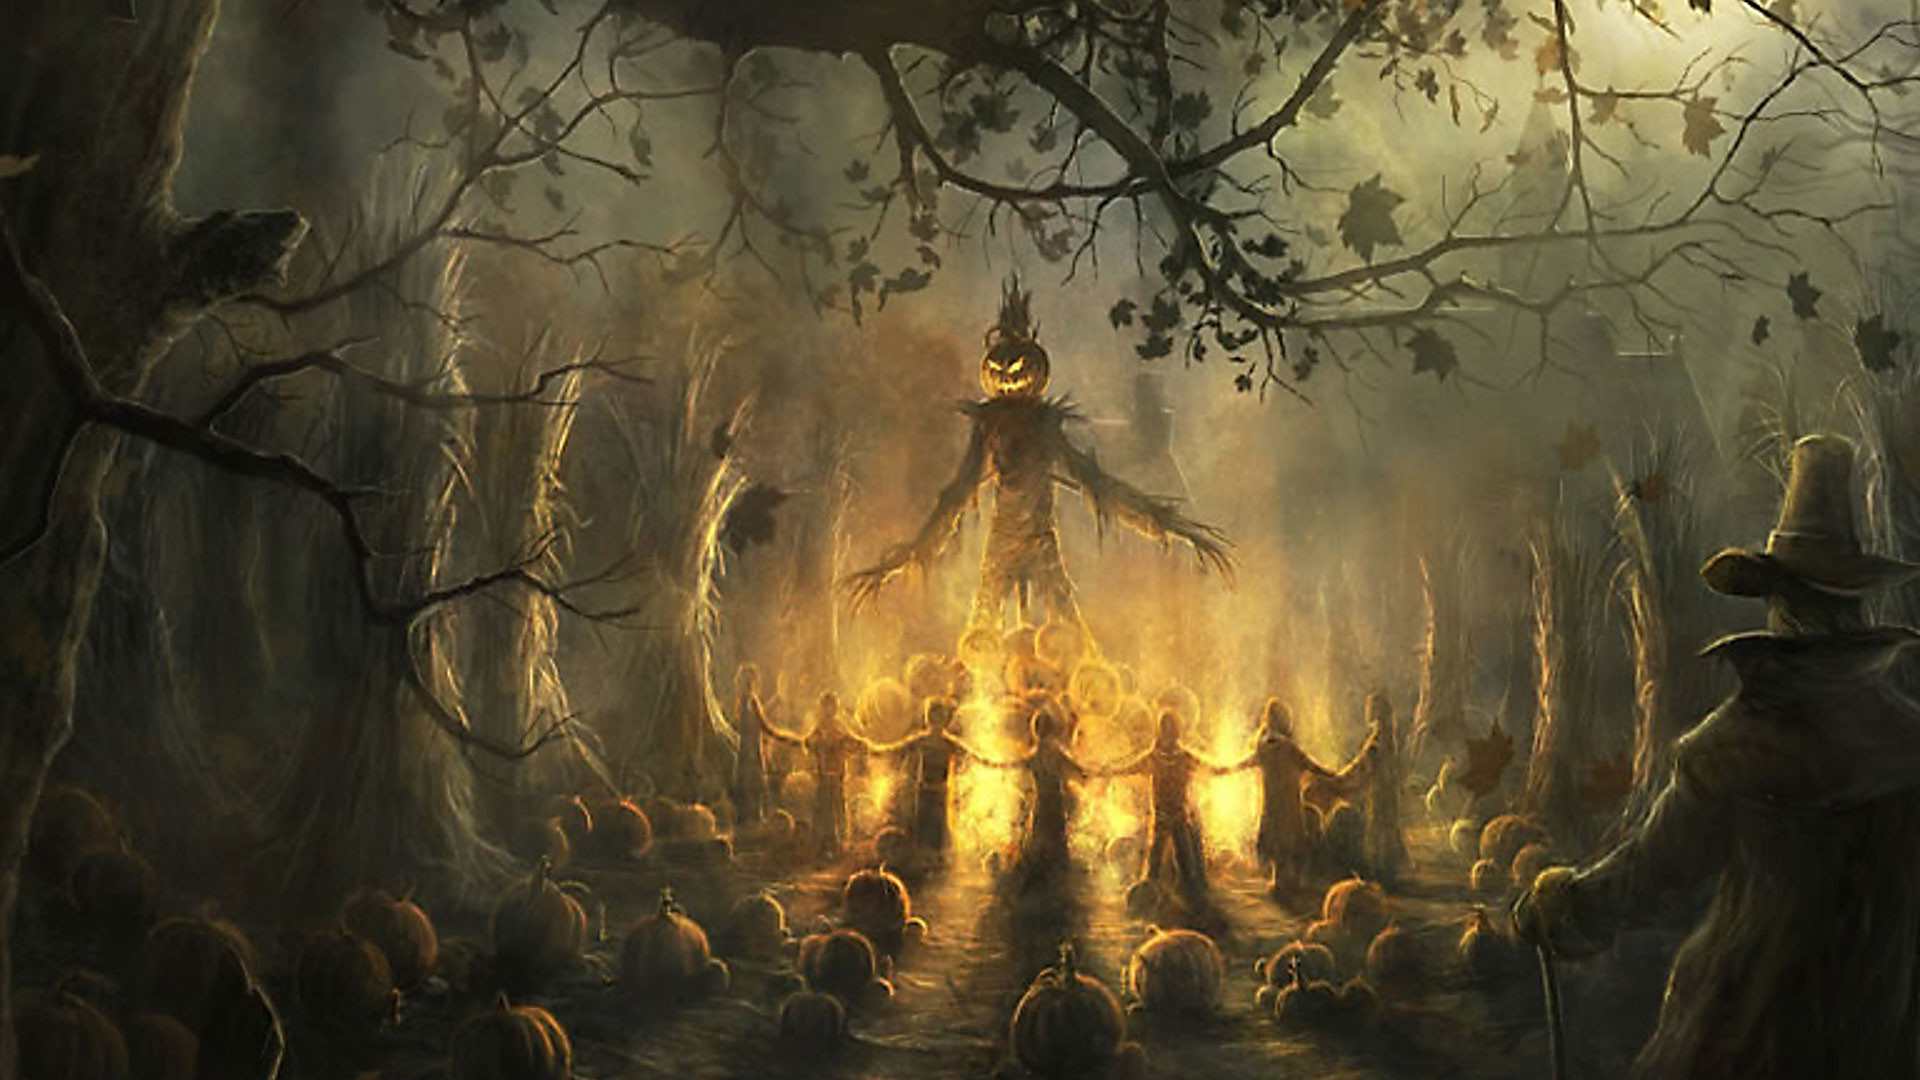 Amazing Wallpaper Halloween Horse - 1201897-beautiful-spooky-halloween-backgrounds-1920x1080-screen  Gallery_804316.jpg